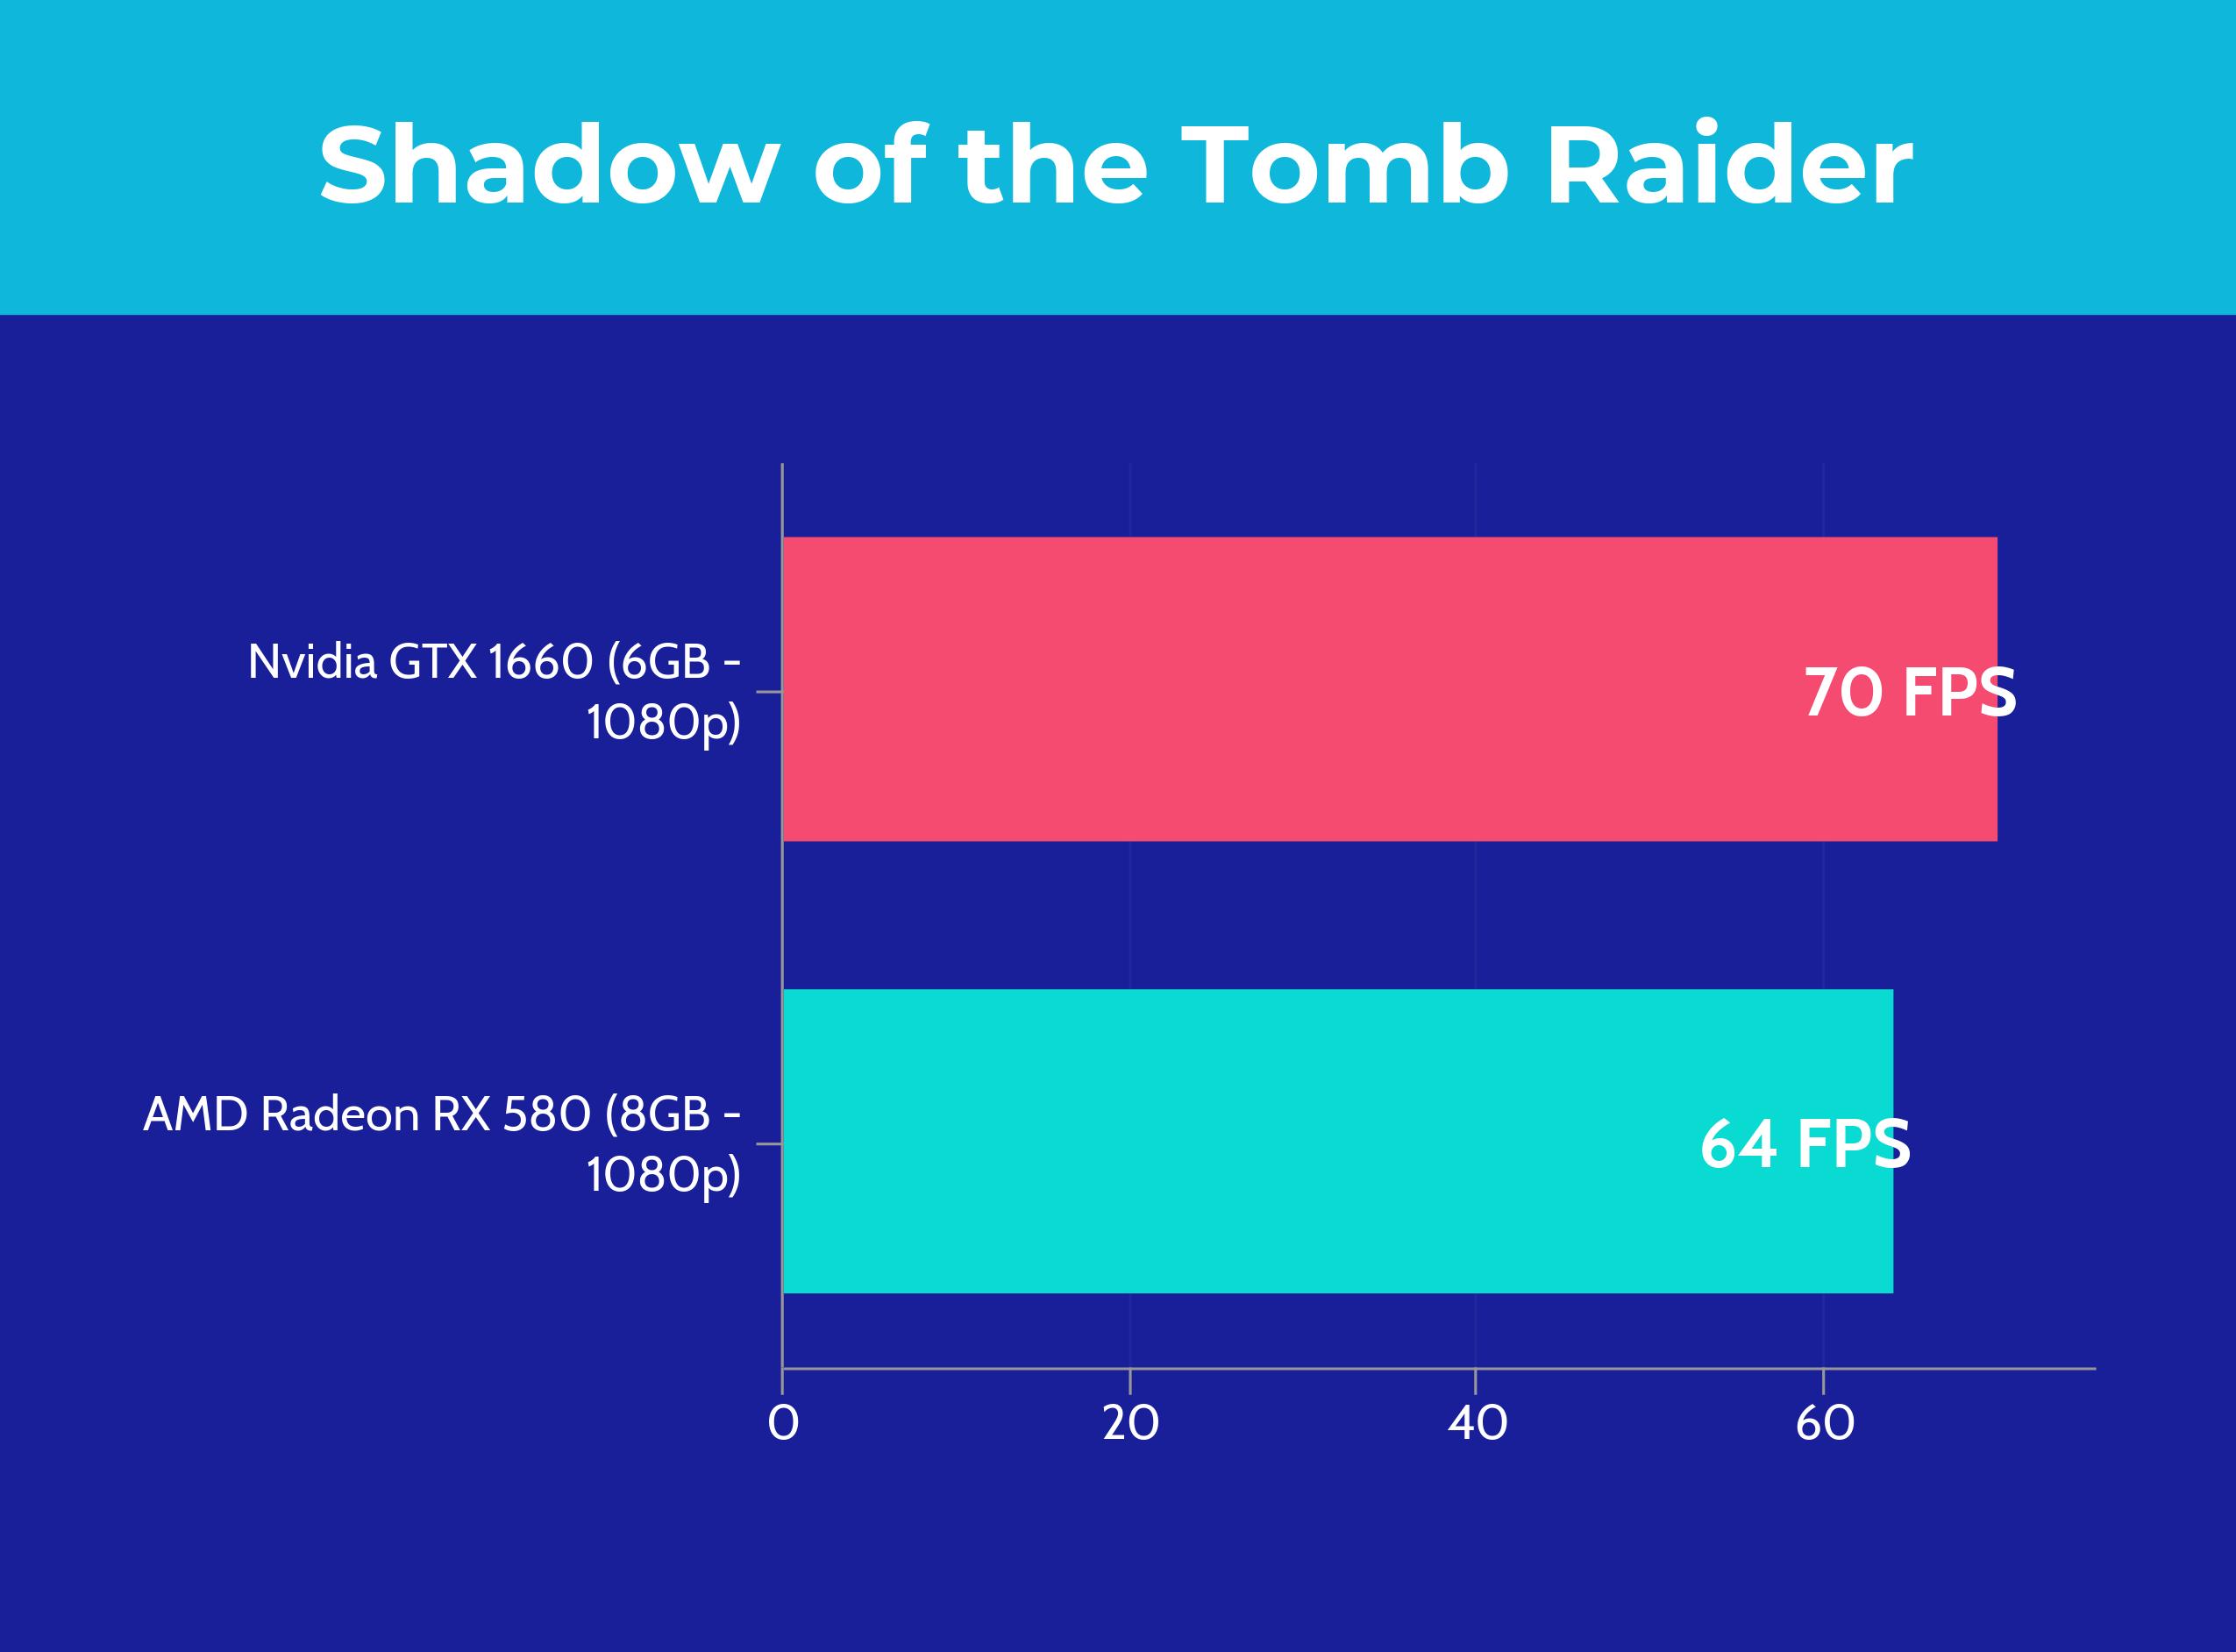 GTX 1660 vs RX 580 - Tomb Raider